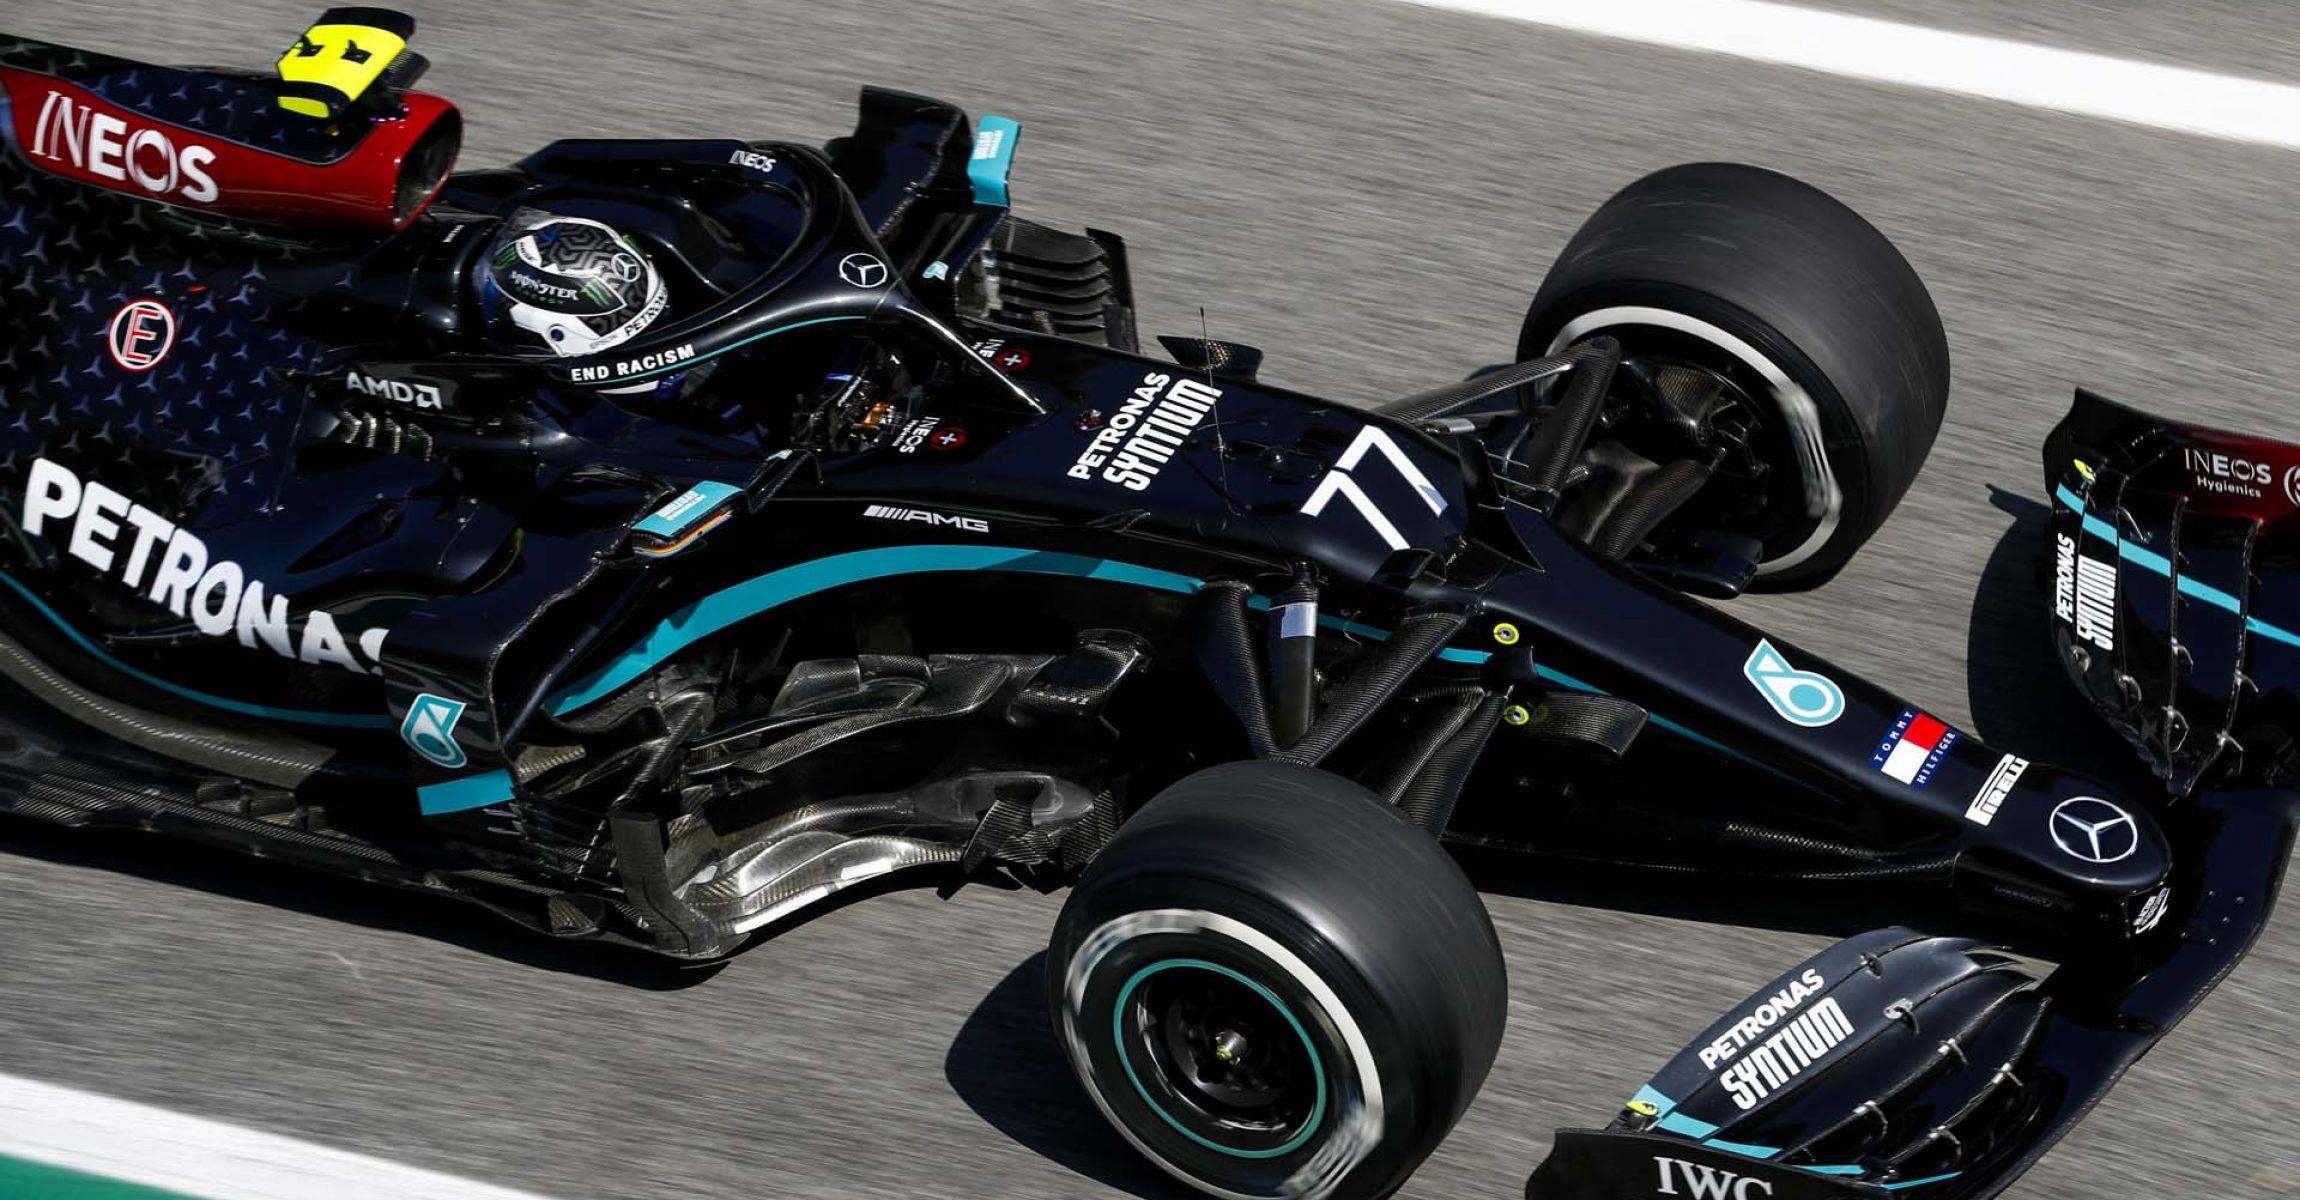 2020 Spanish Grand Prix, Friday - LAT Images Valtteri Bottas Mercedes